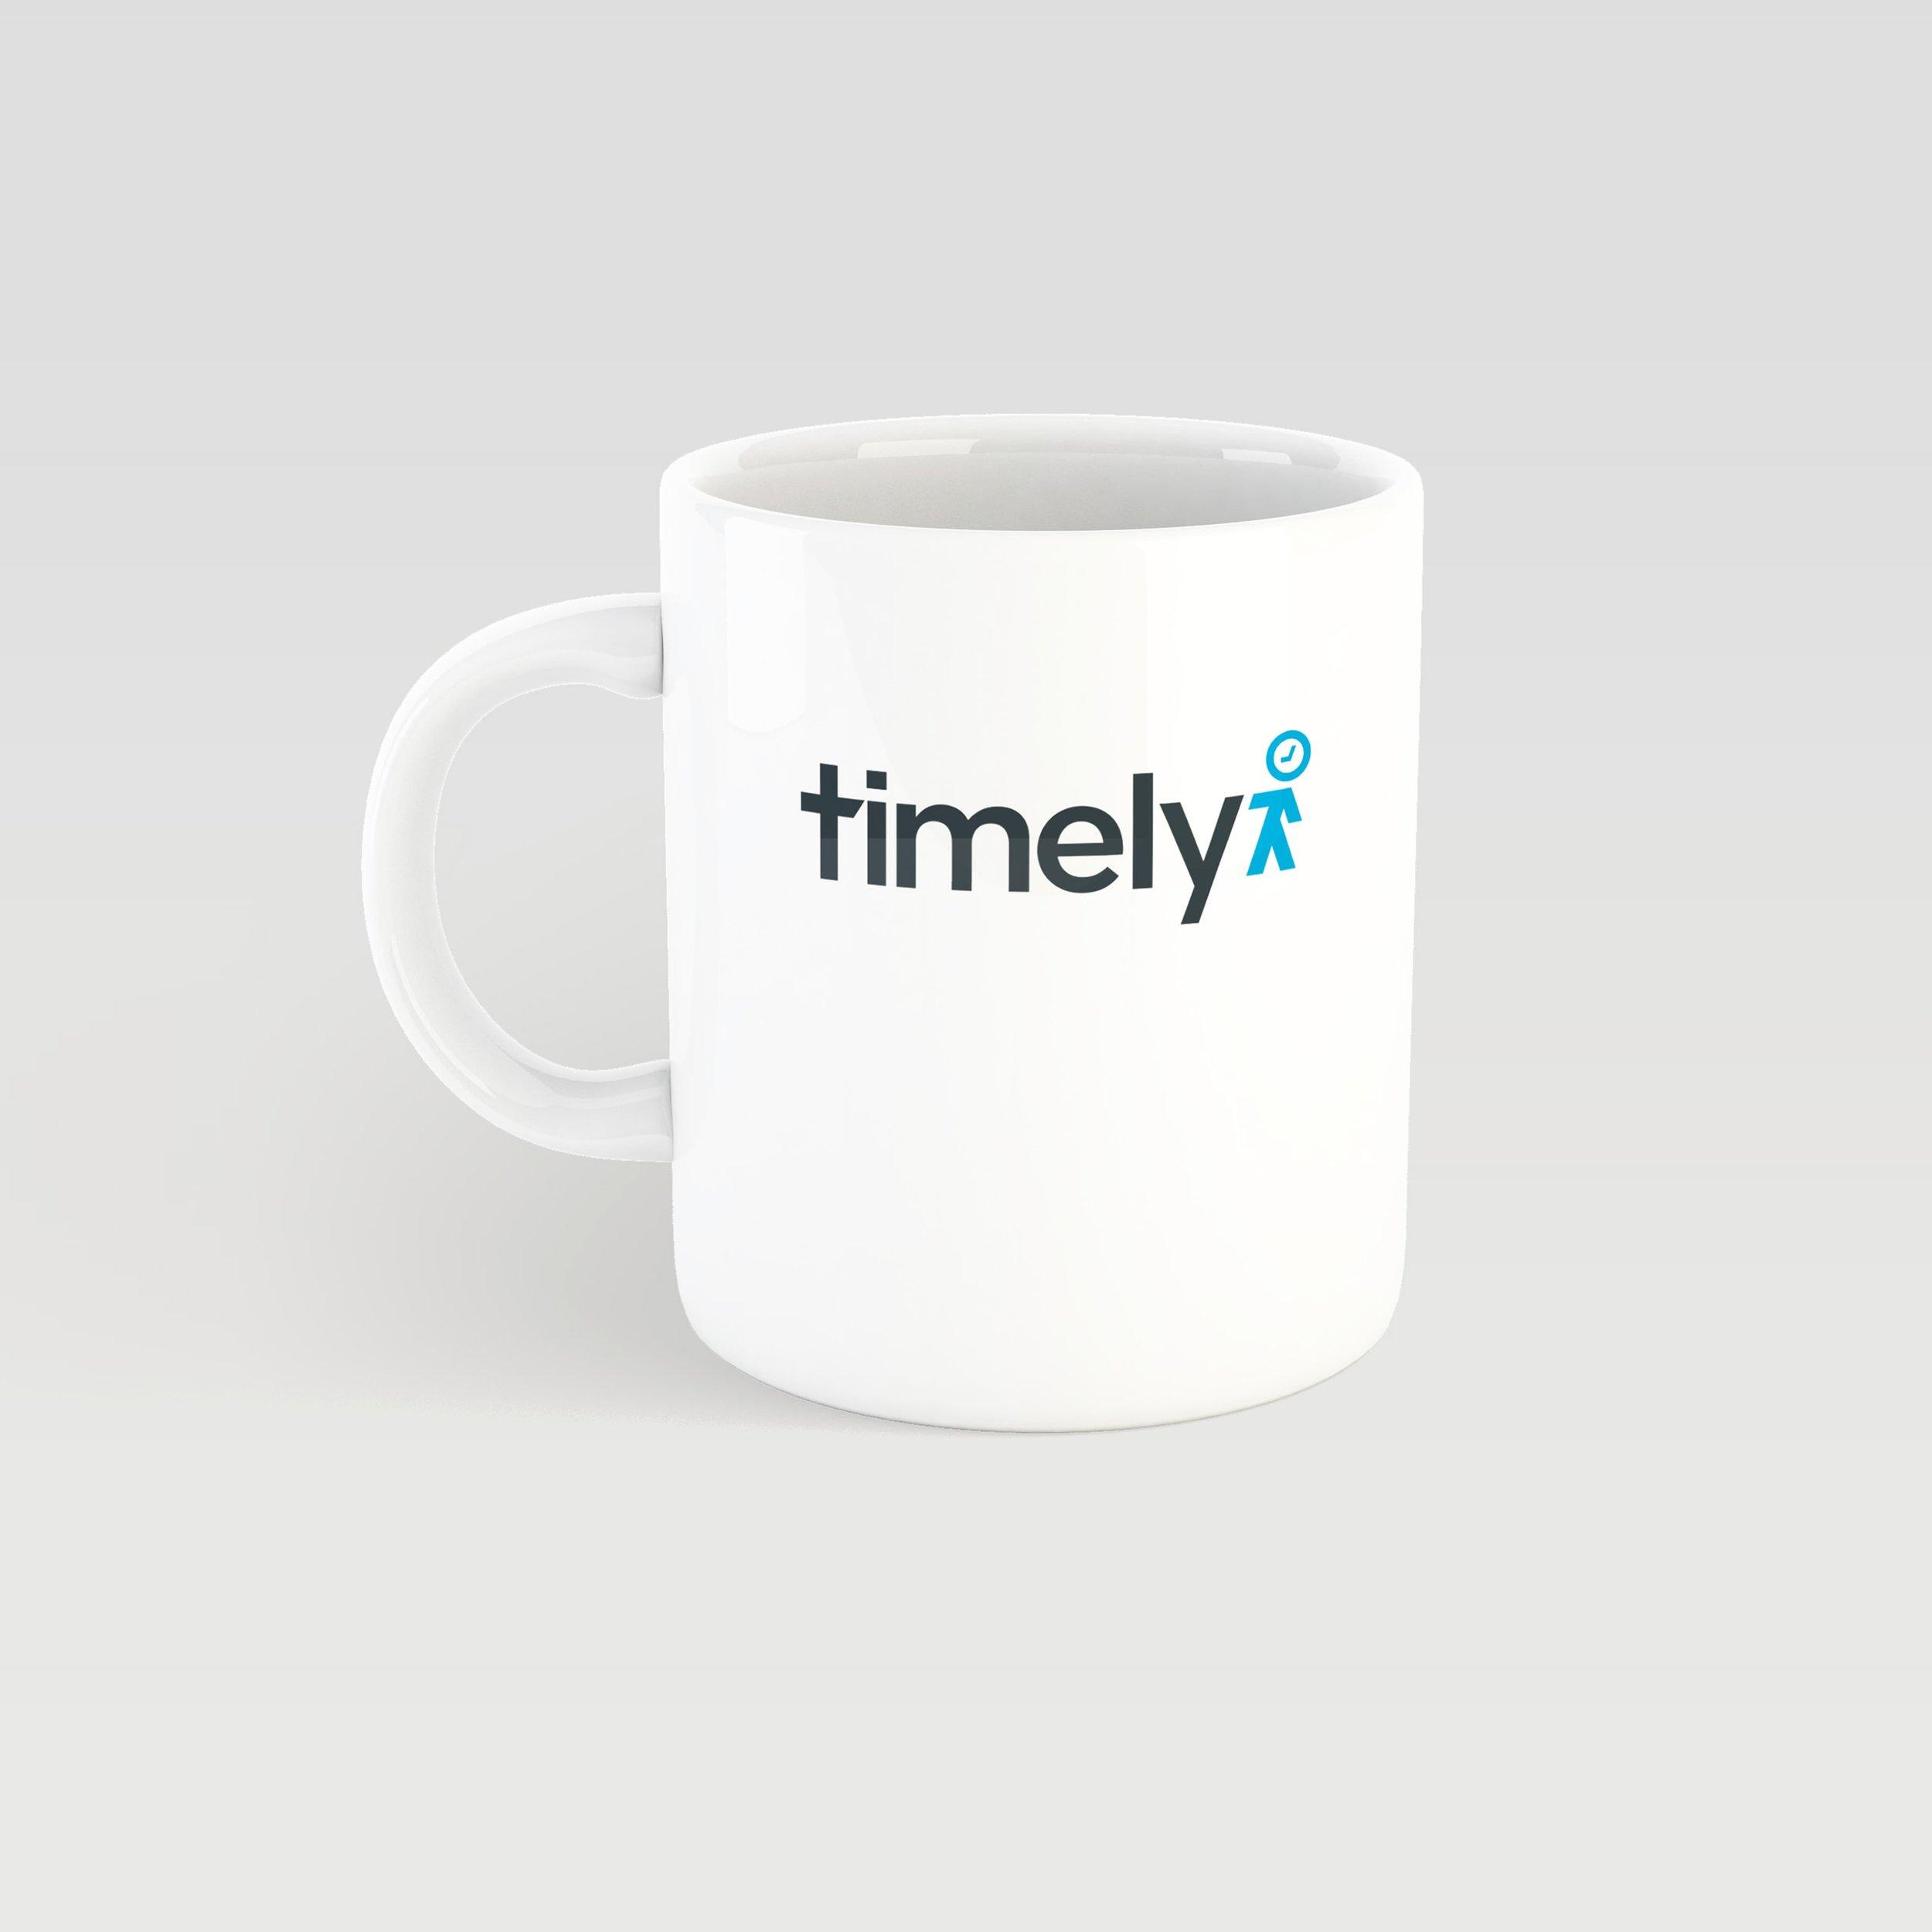 Timely Mug (square)-min.jpg